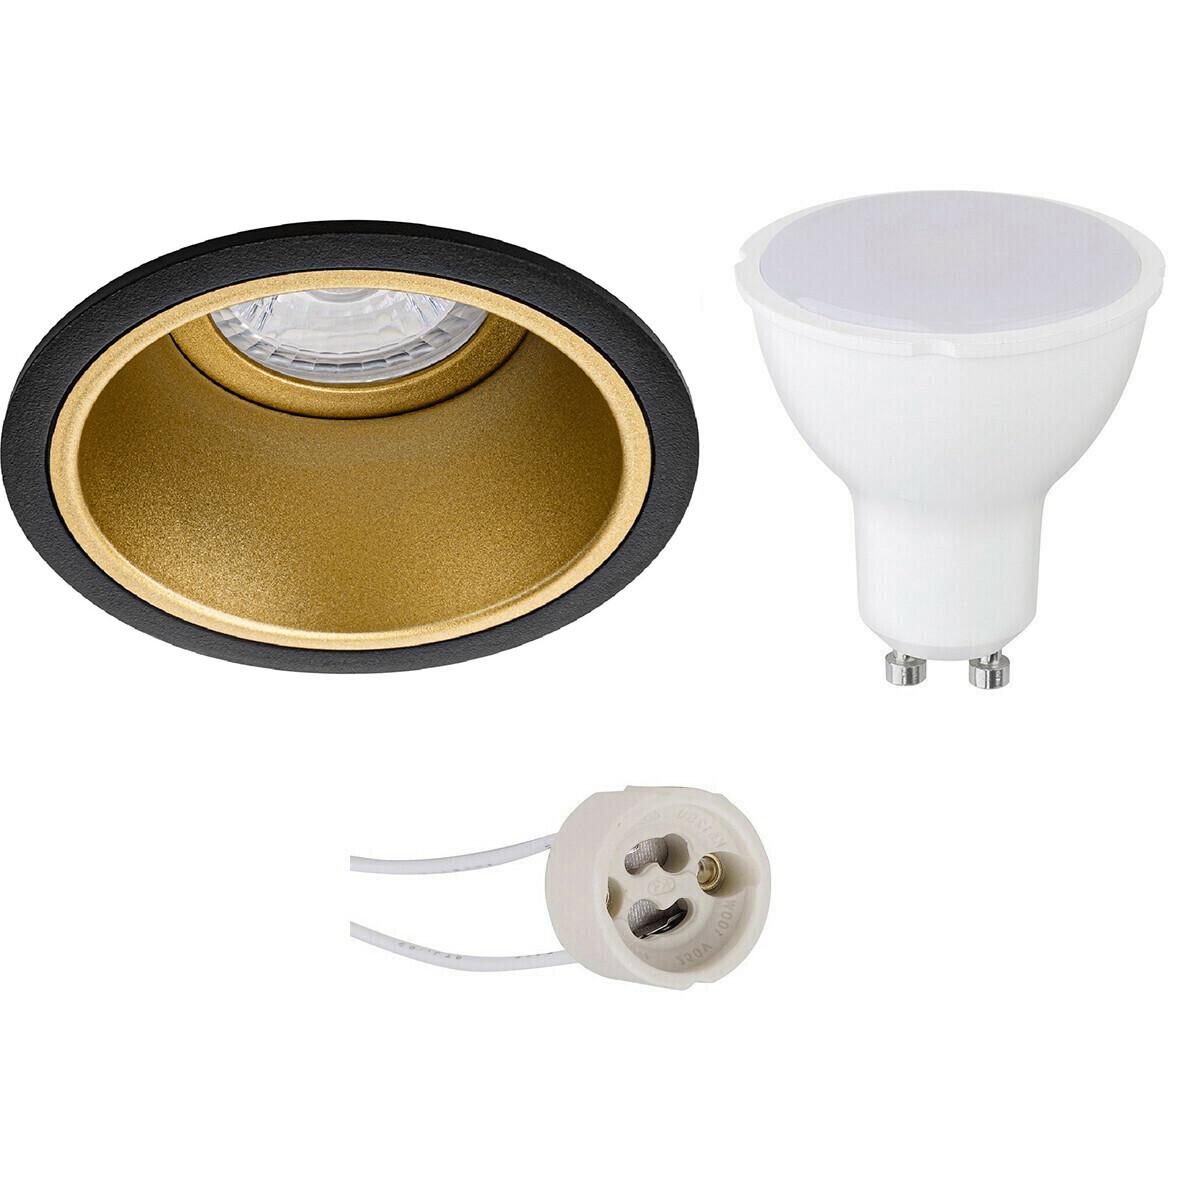 LED Spot Set - Pragmi Minko Pro - GU10 Fitting - Inbouw Rond - Mat Zwart/Goud - 8W - Natuurlijk Wit